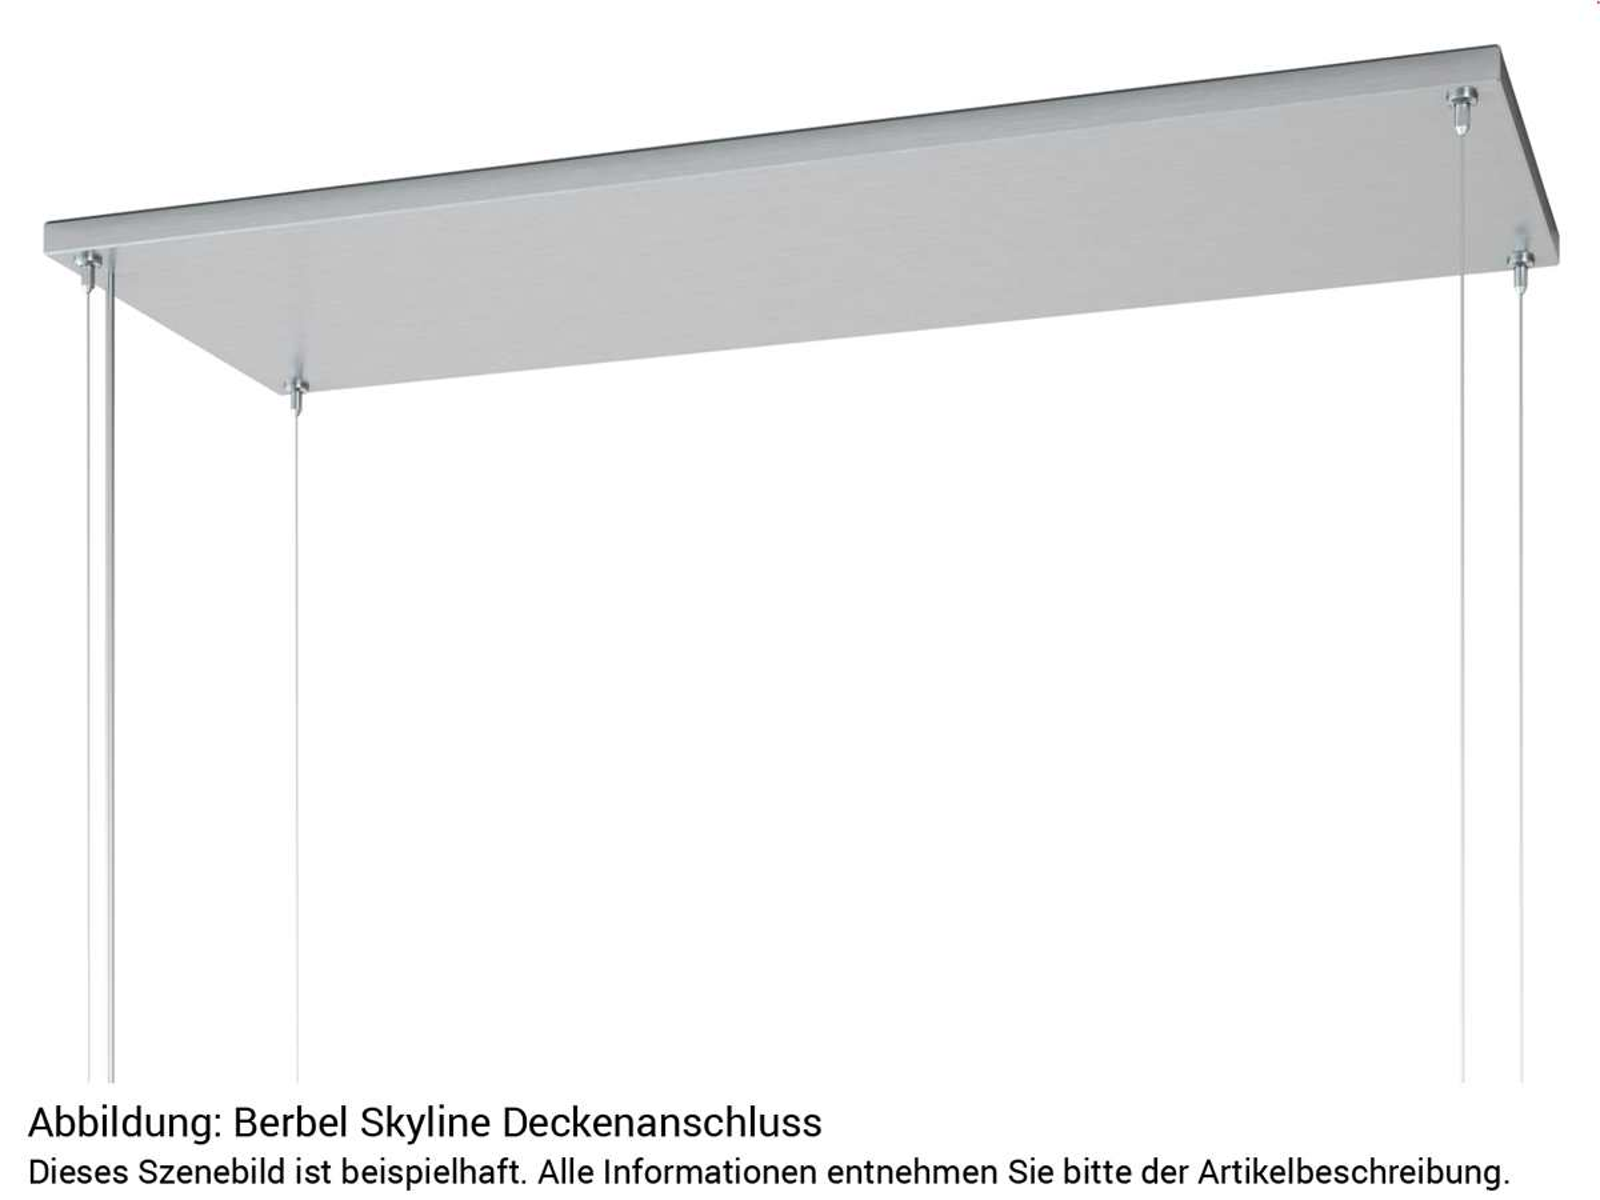 Berbel Skyline BDL 115 SK Deckenlifthaube Schwarz